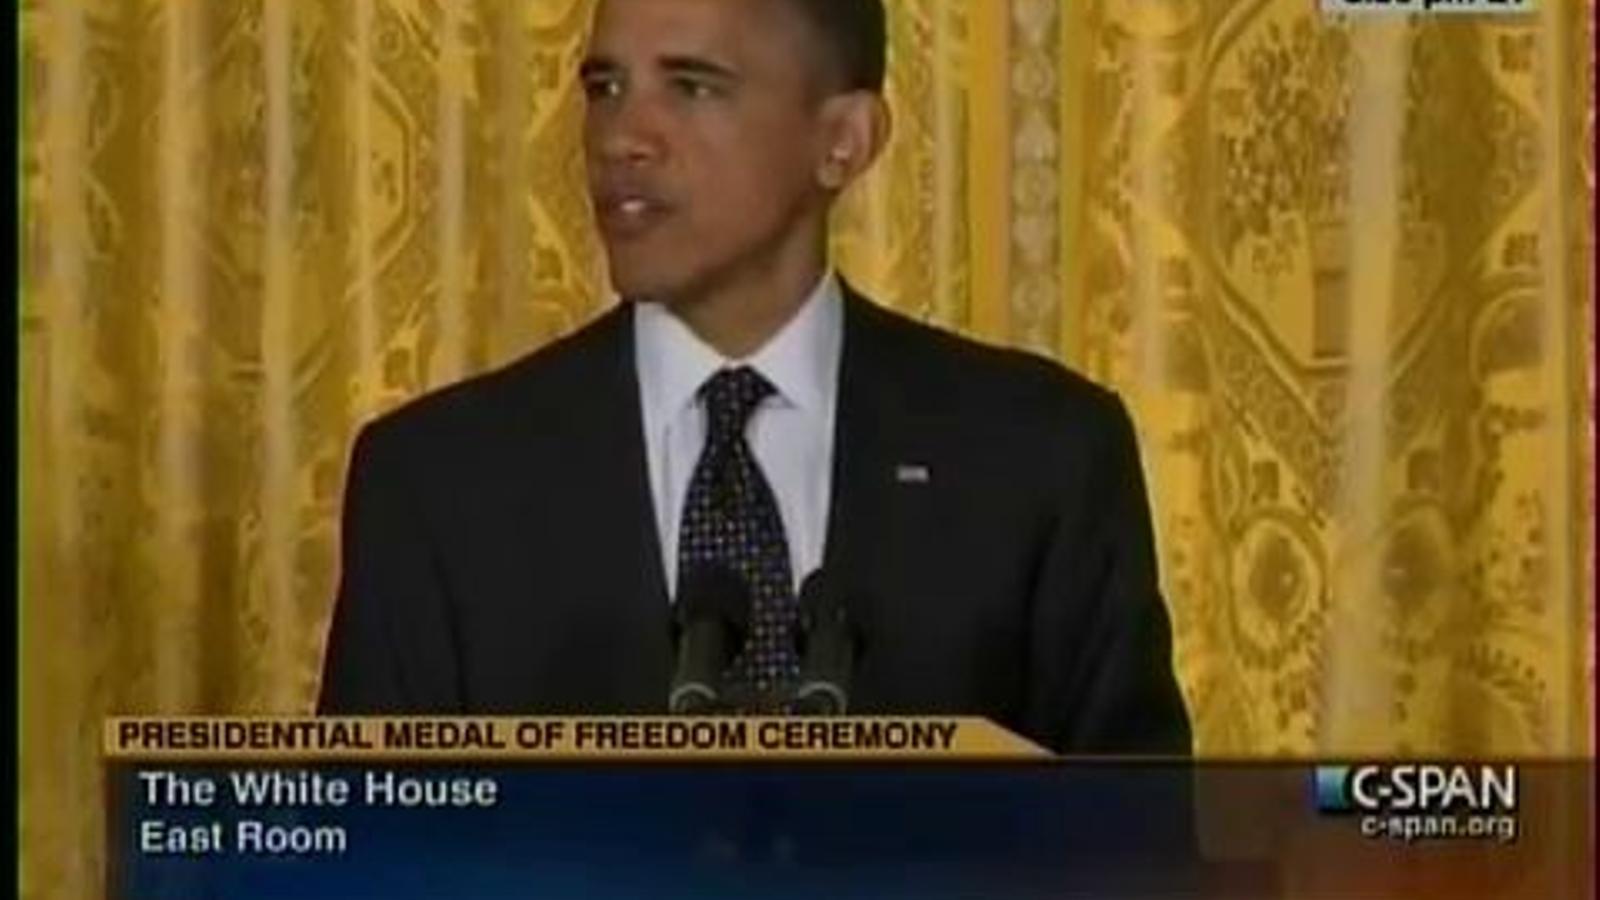 Obama fa referència als camps nazis com a camps d'extermini polonesos